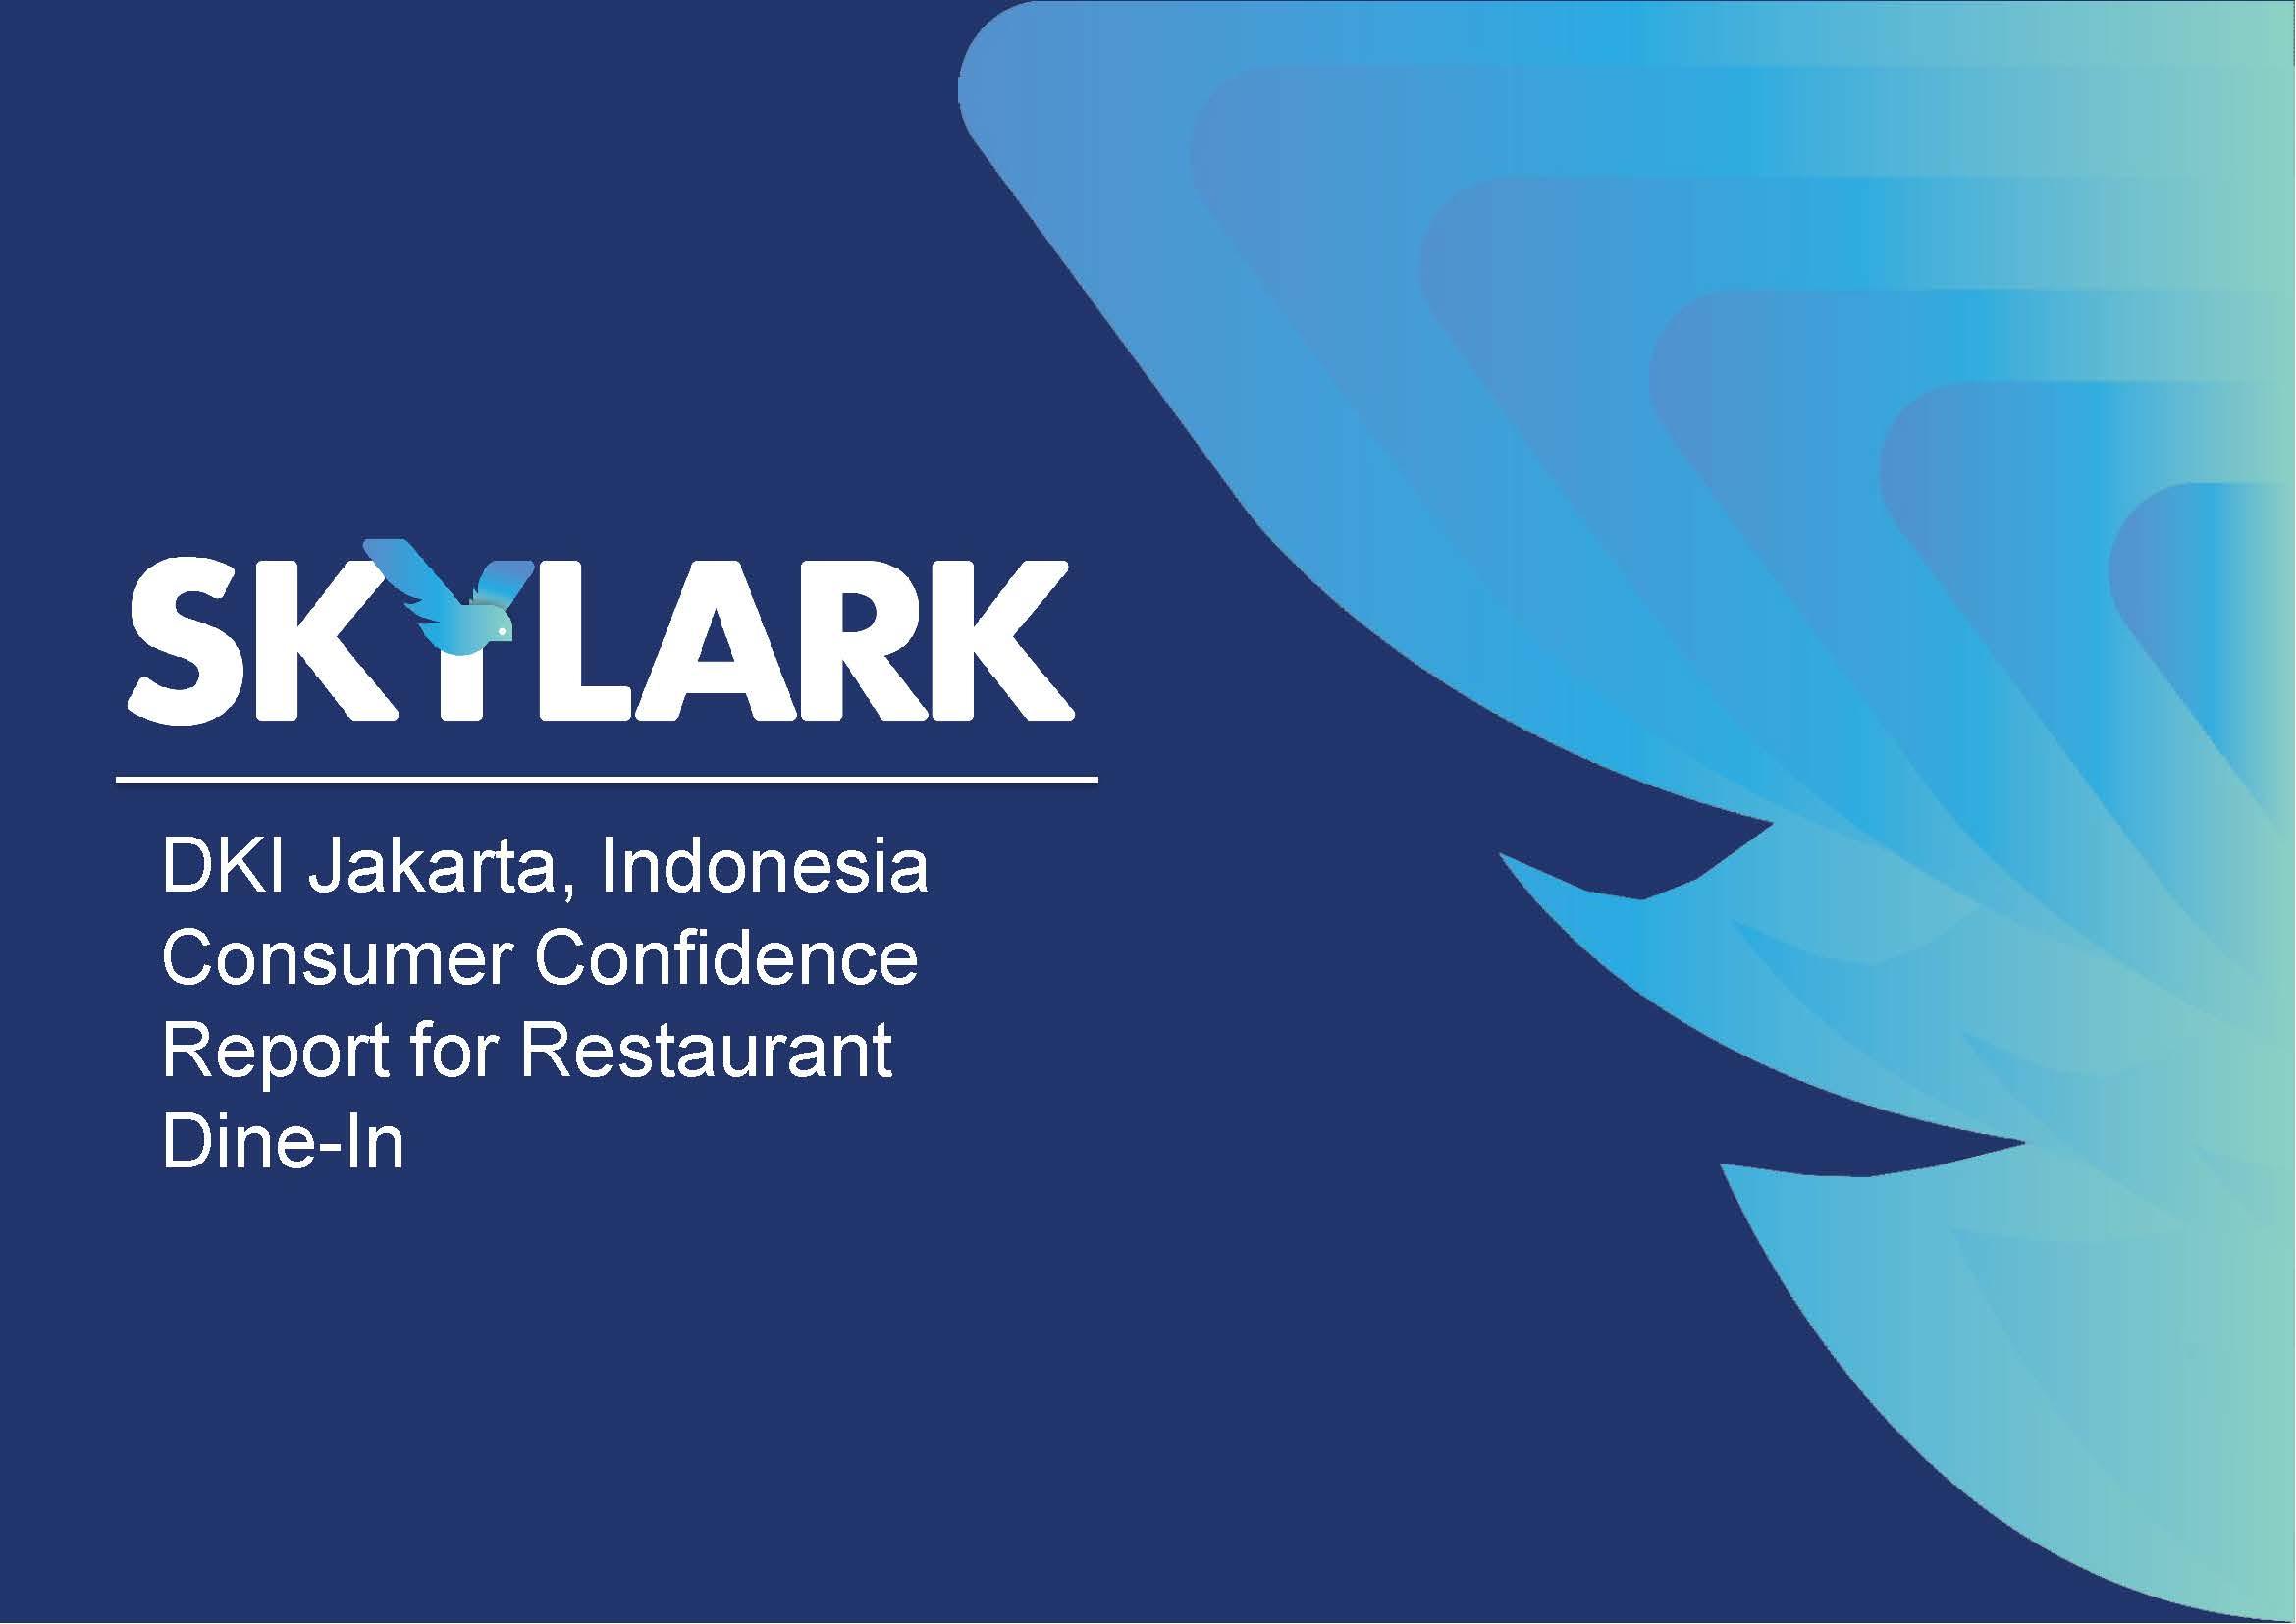 DKI Jakarta, Indonesia Consumer Confidence Report for Restaurant Dine-In